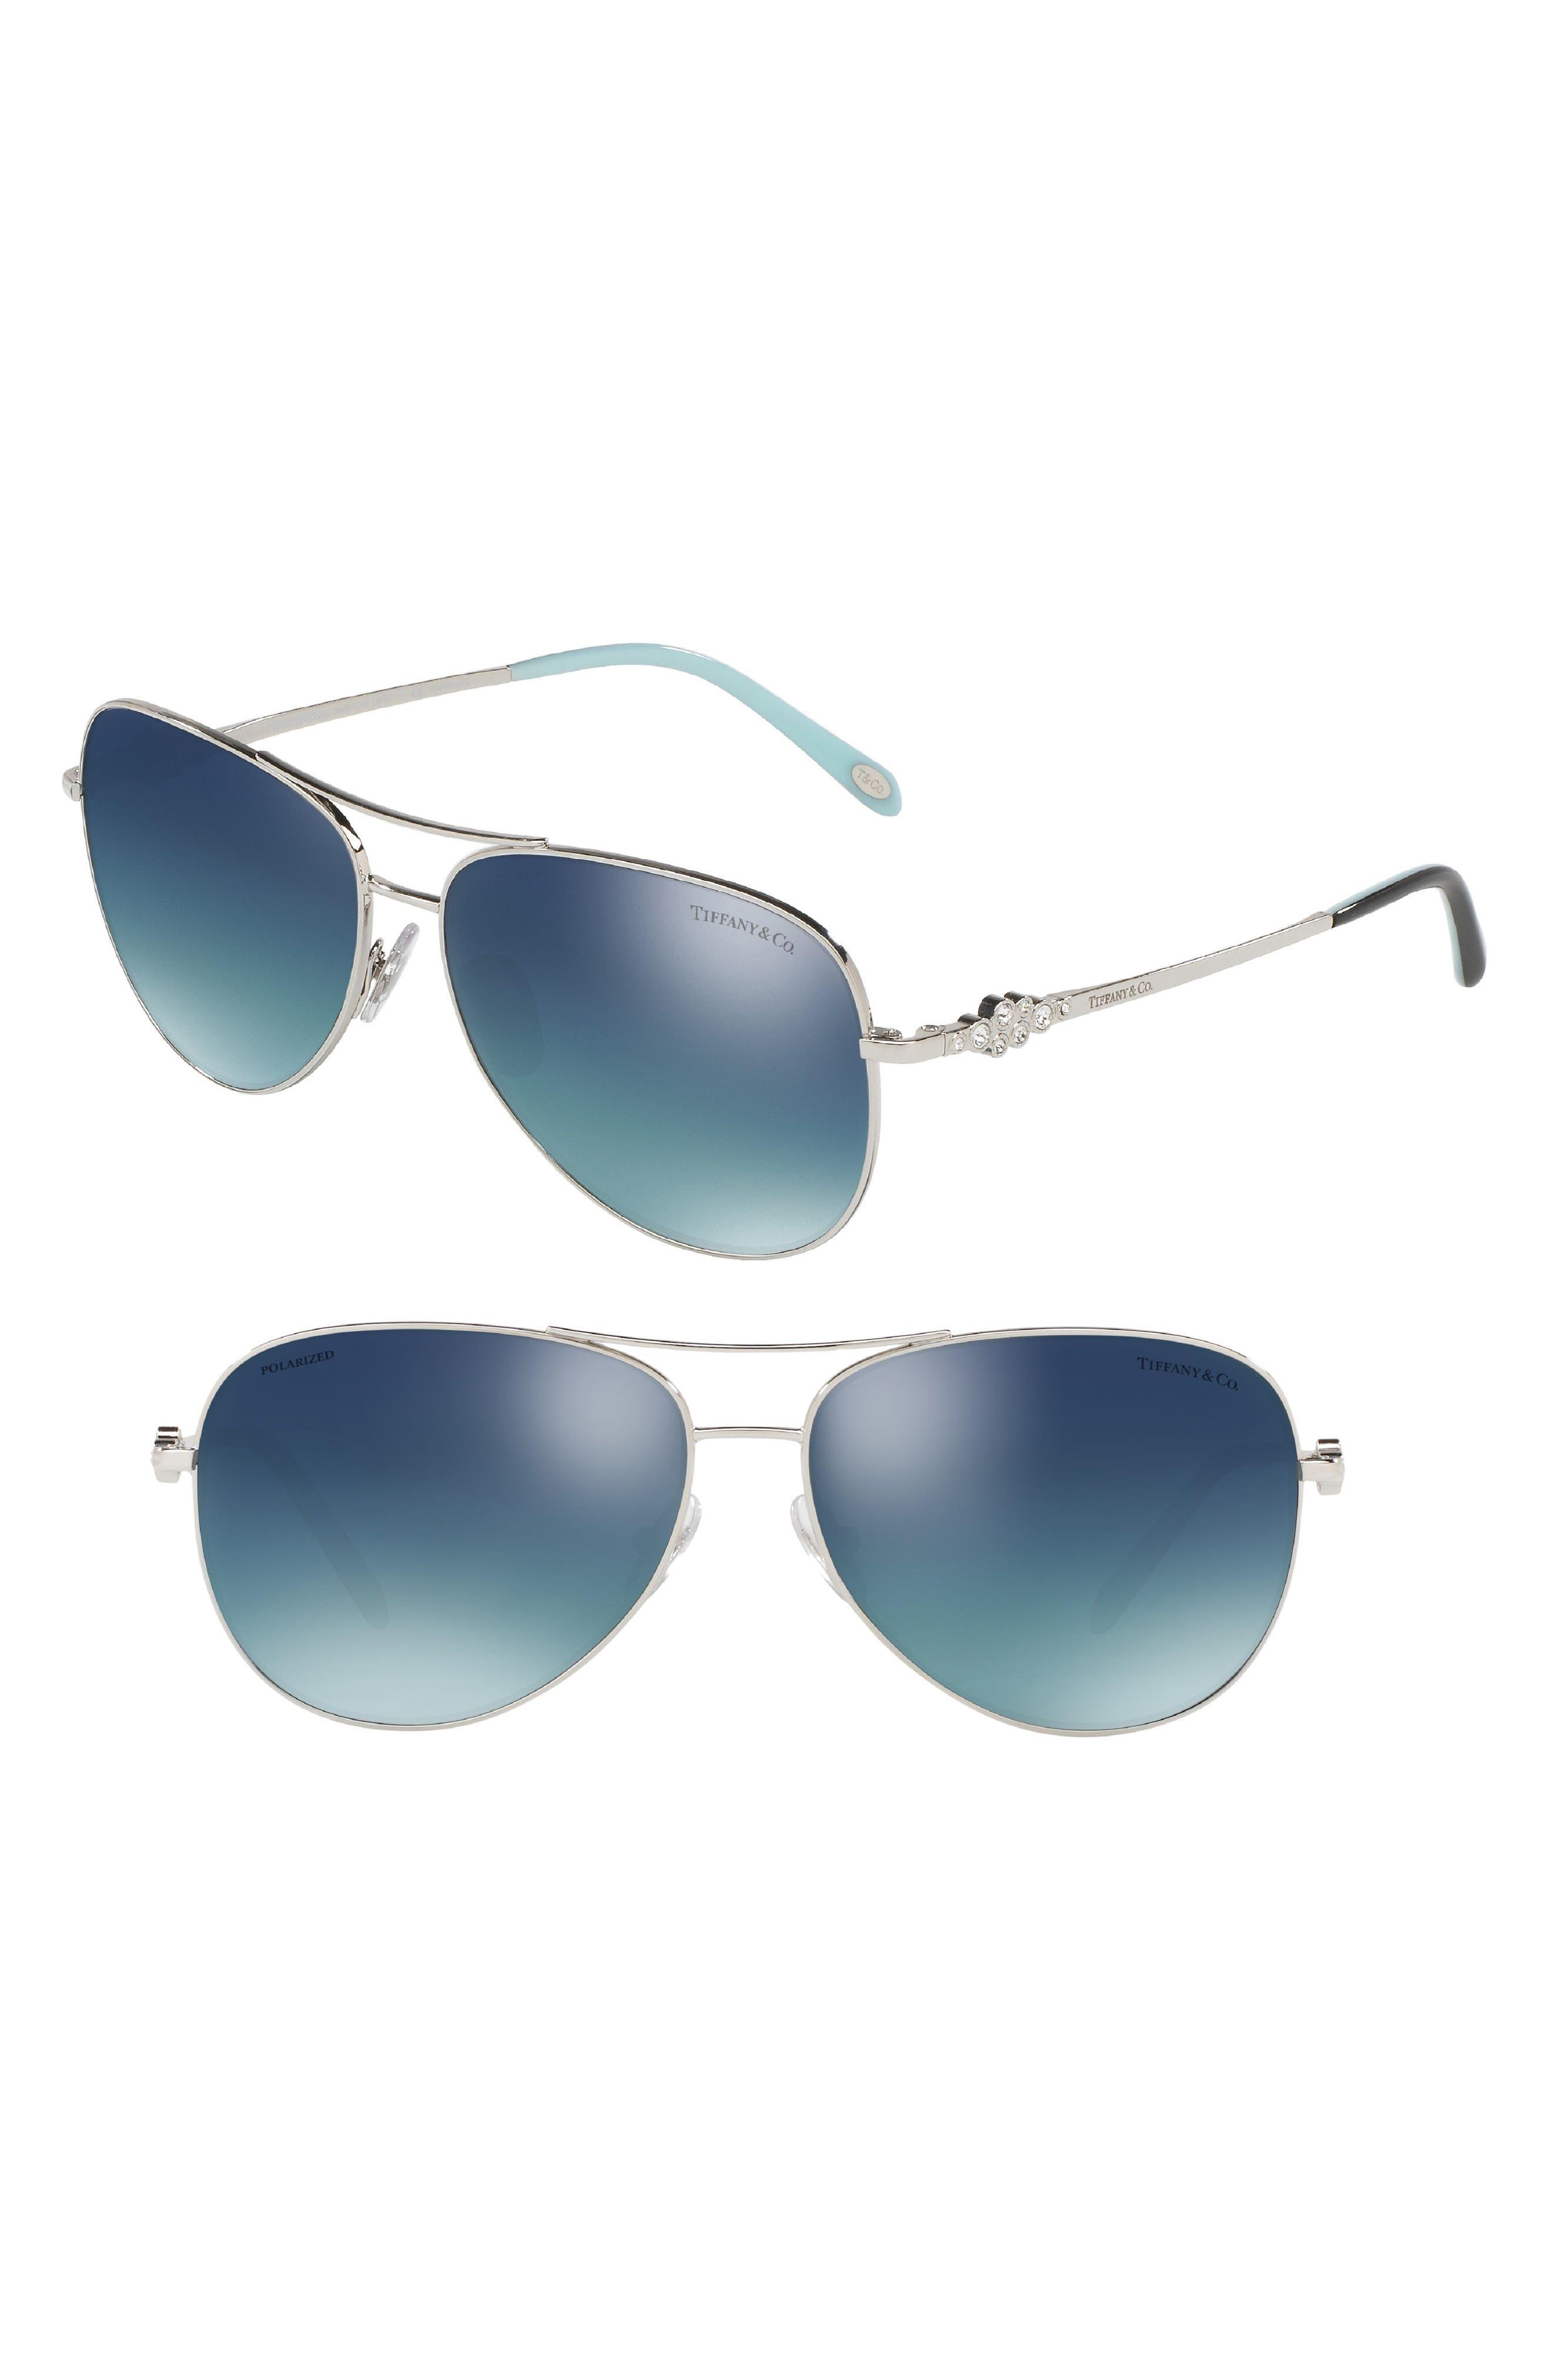 Tiffany 59mm Polarized Metal Aviator Sunglasses,                         Main,                         color, Silver Gradient Mirror